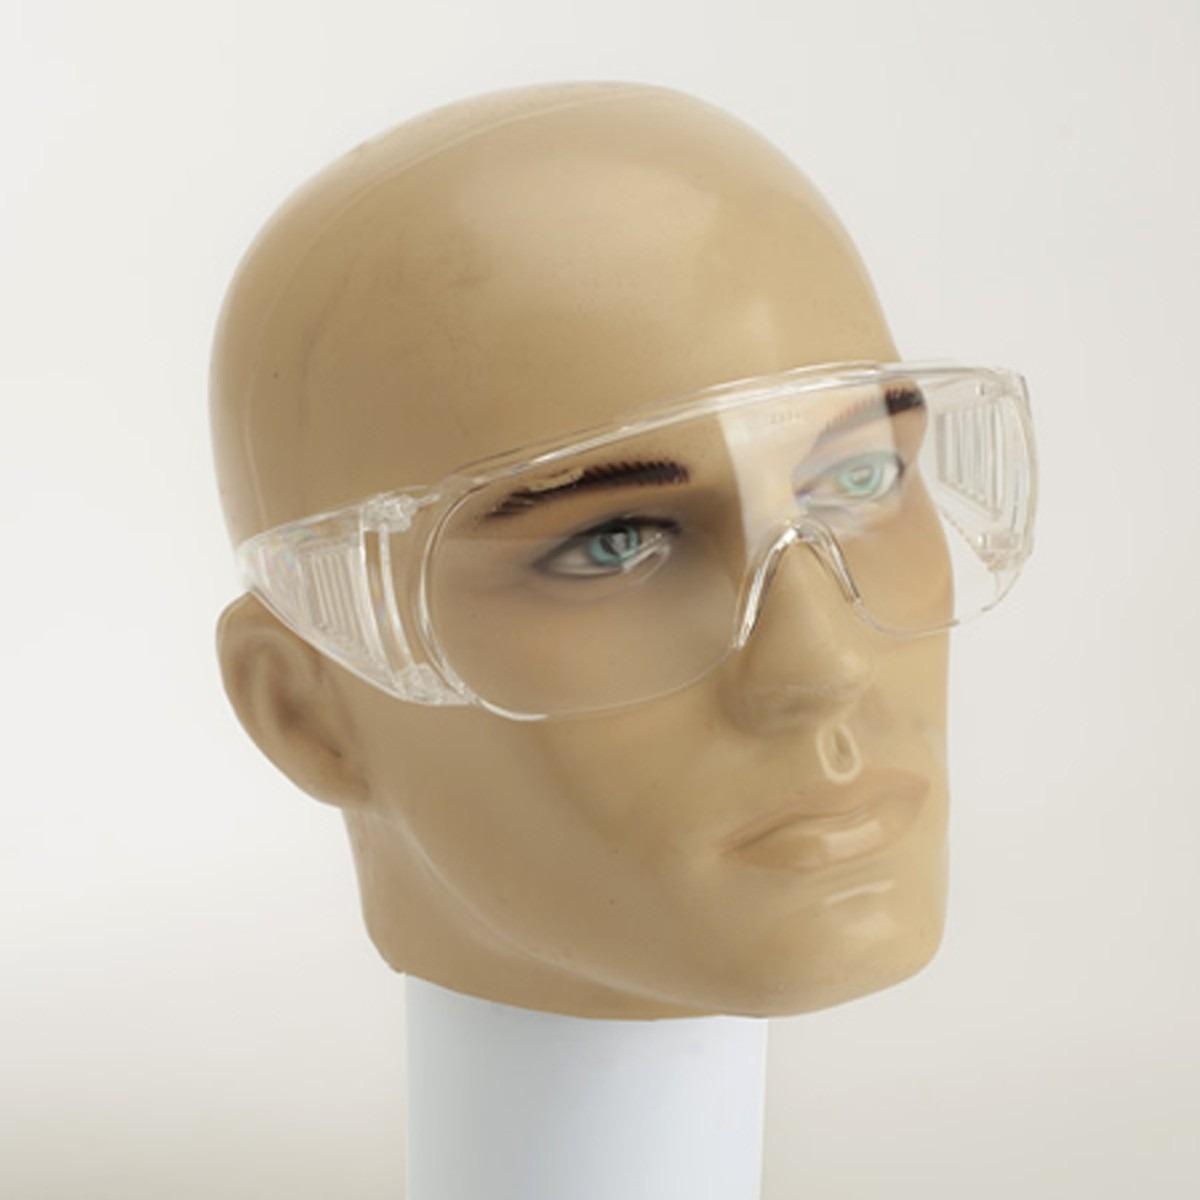 4c1900f43036c óculos segurança epi 3m vision 2000 incolor anti riscos 3 un. Carregando  zoom.